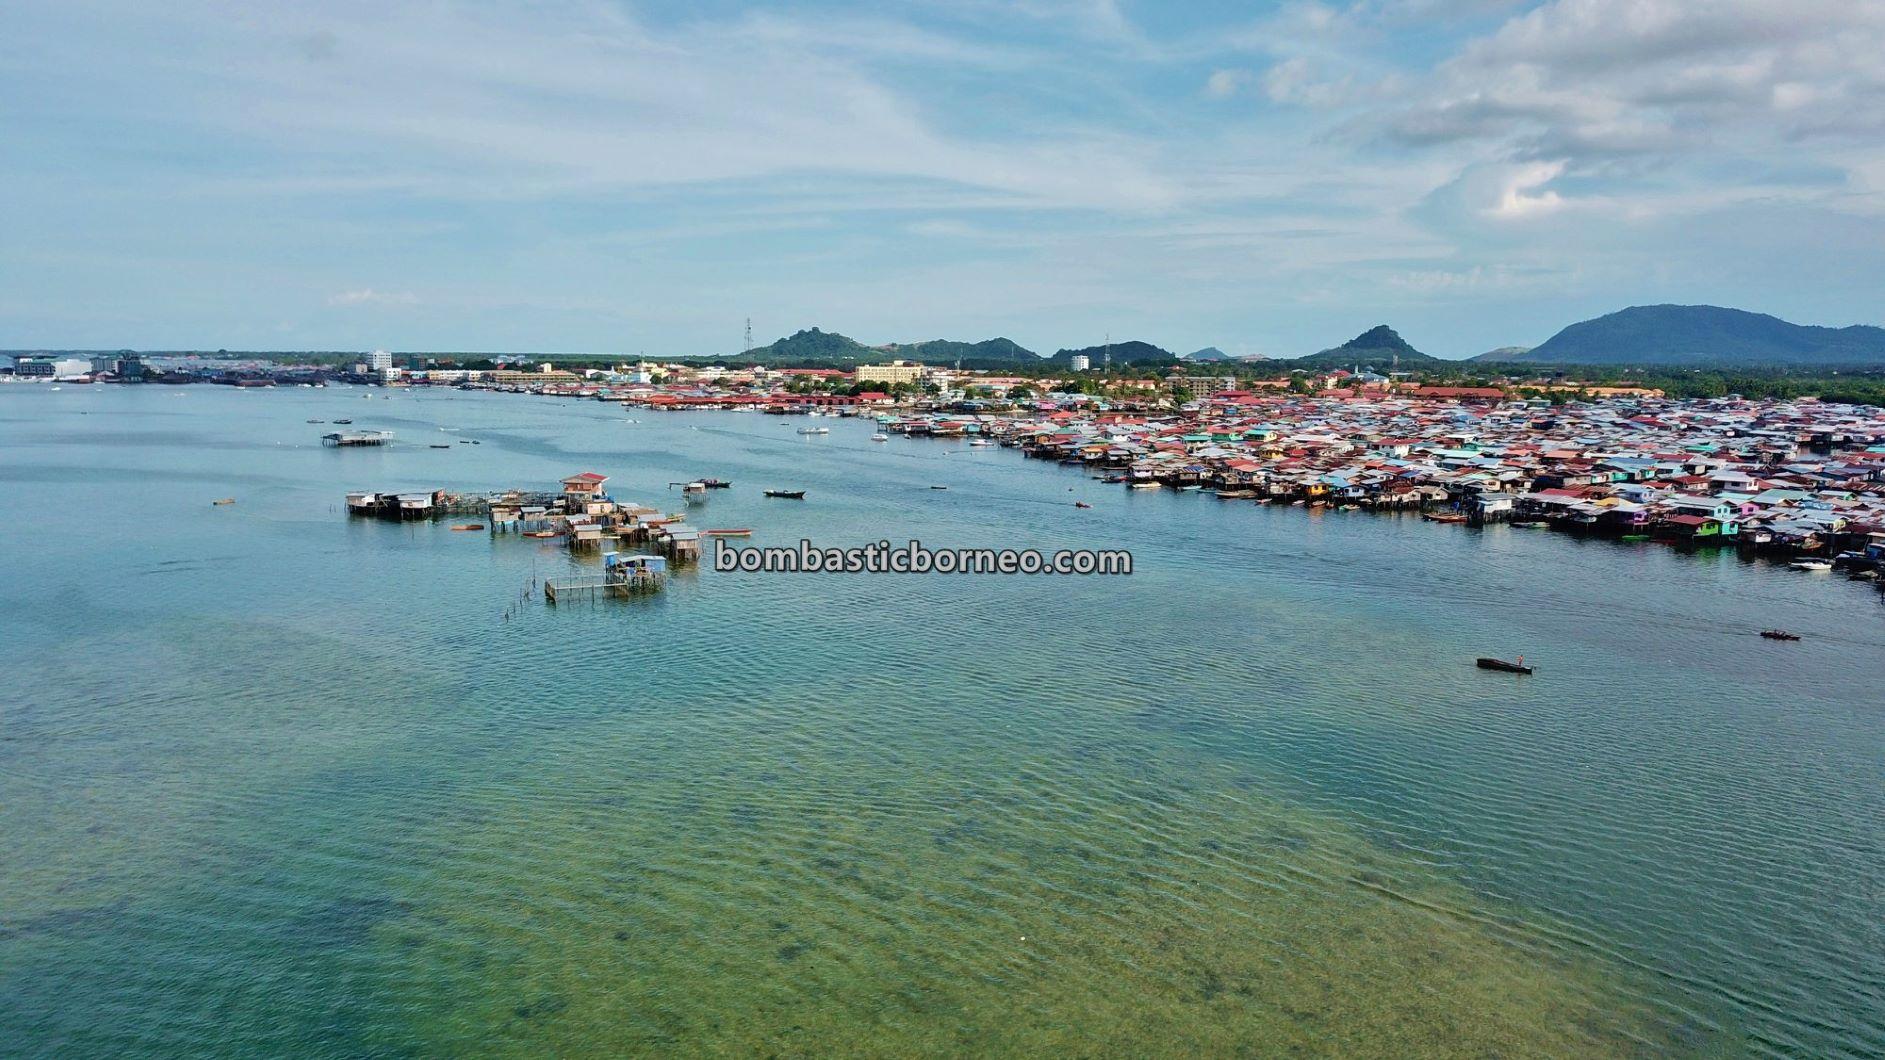 Pesta Regatta Lepa, Water Festival, backpackers, Sea Gypsies, Suku Bajau Laut, island, Tawau, Tourism, travel guide, Trans Borneo, 探索婆罗洲游踪, 马来西亚仙本那, 沙巴旅游景点,